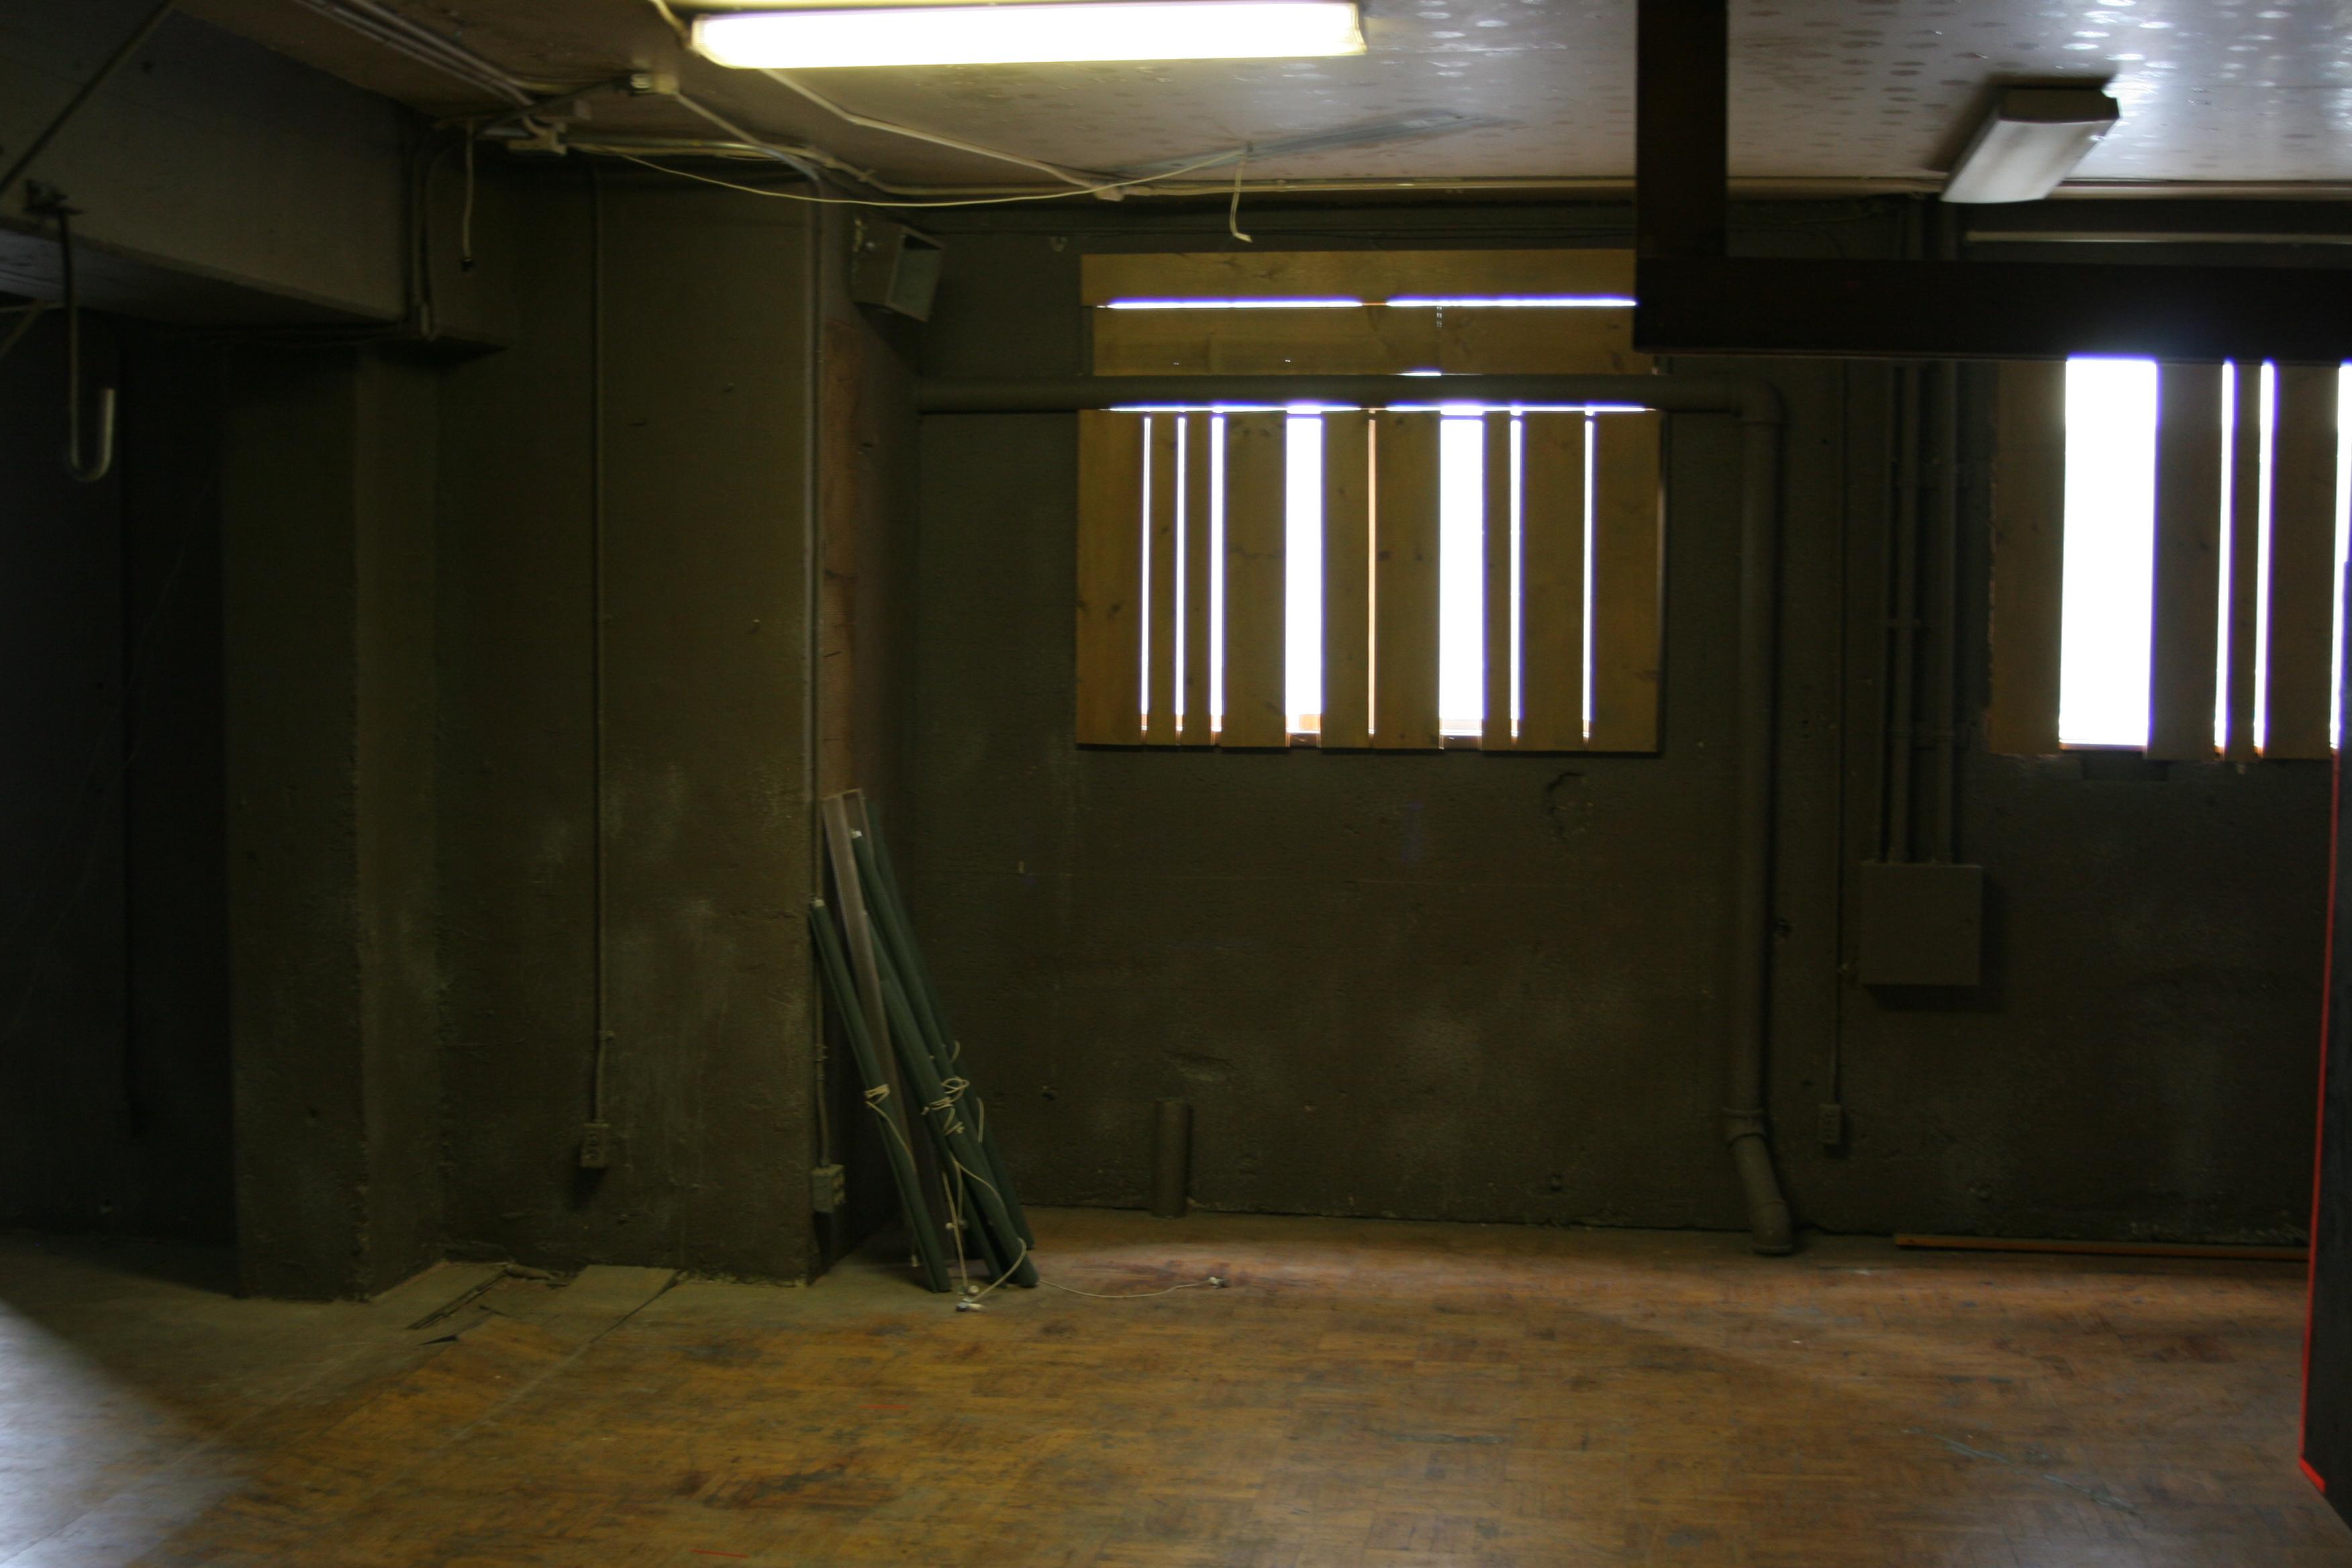 Perks At Work >> Halls, Stairs, Exterior, etc - Herald Examiner Los Angeles ...